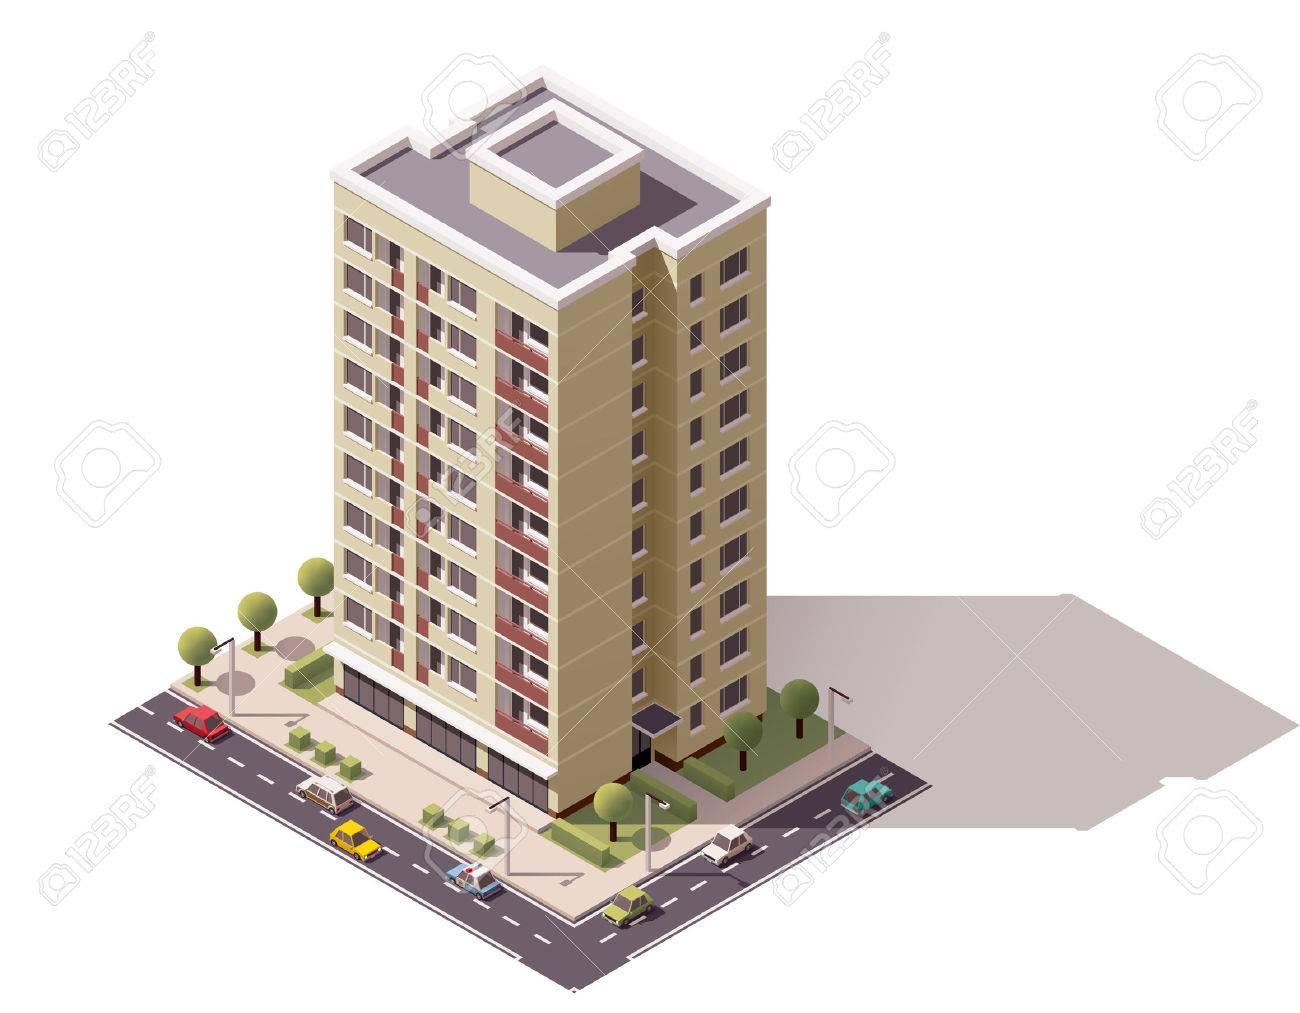 Isometric icon representing city building - 52548981